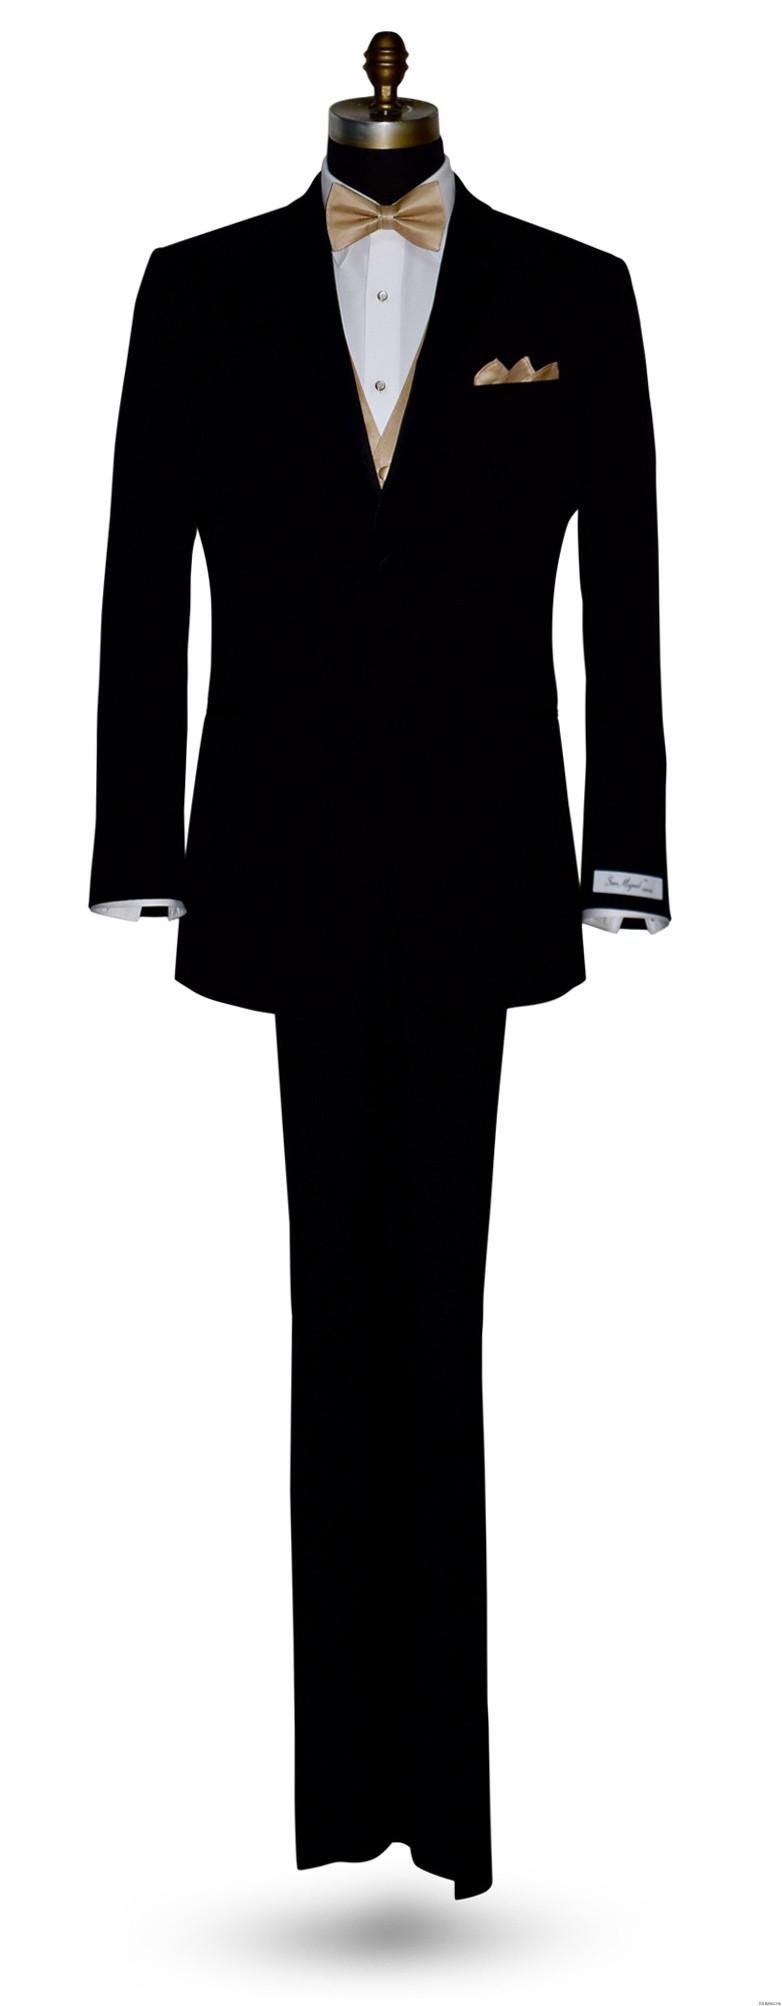 San Miguel black tuxedo with pre-tied golden bowtie and golden vest